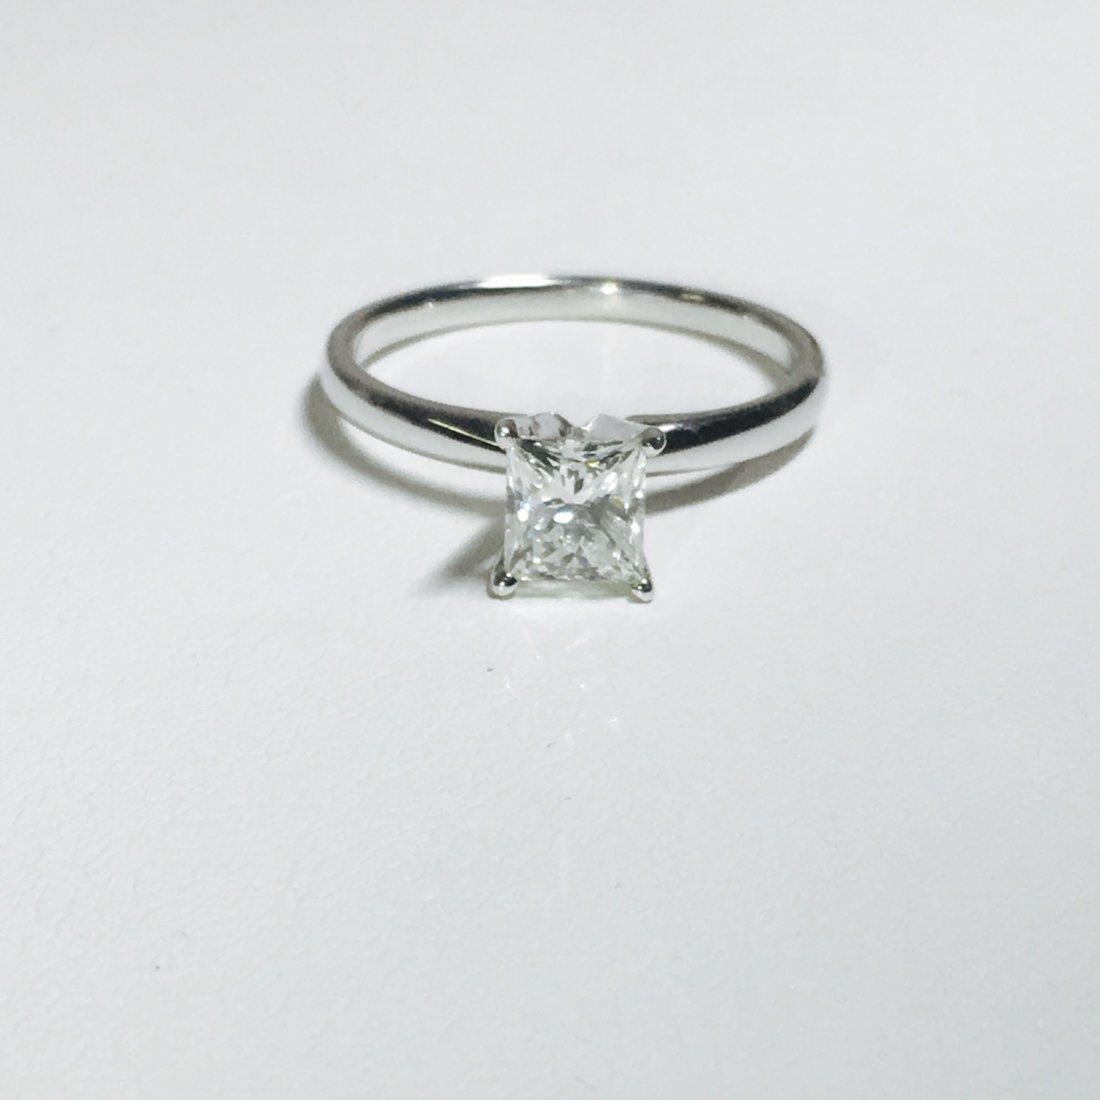 14K White Gold, Solitaire Diamond Engagement Ring (GIA)